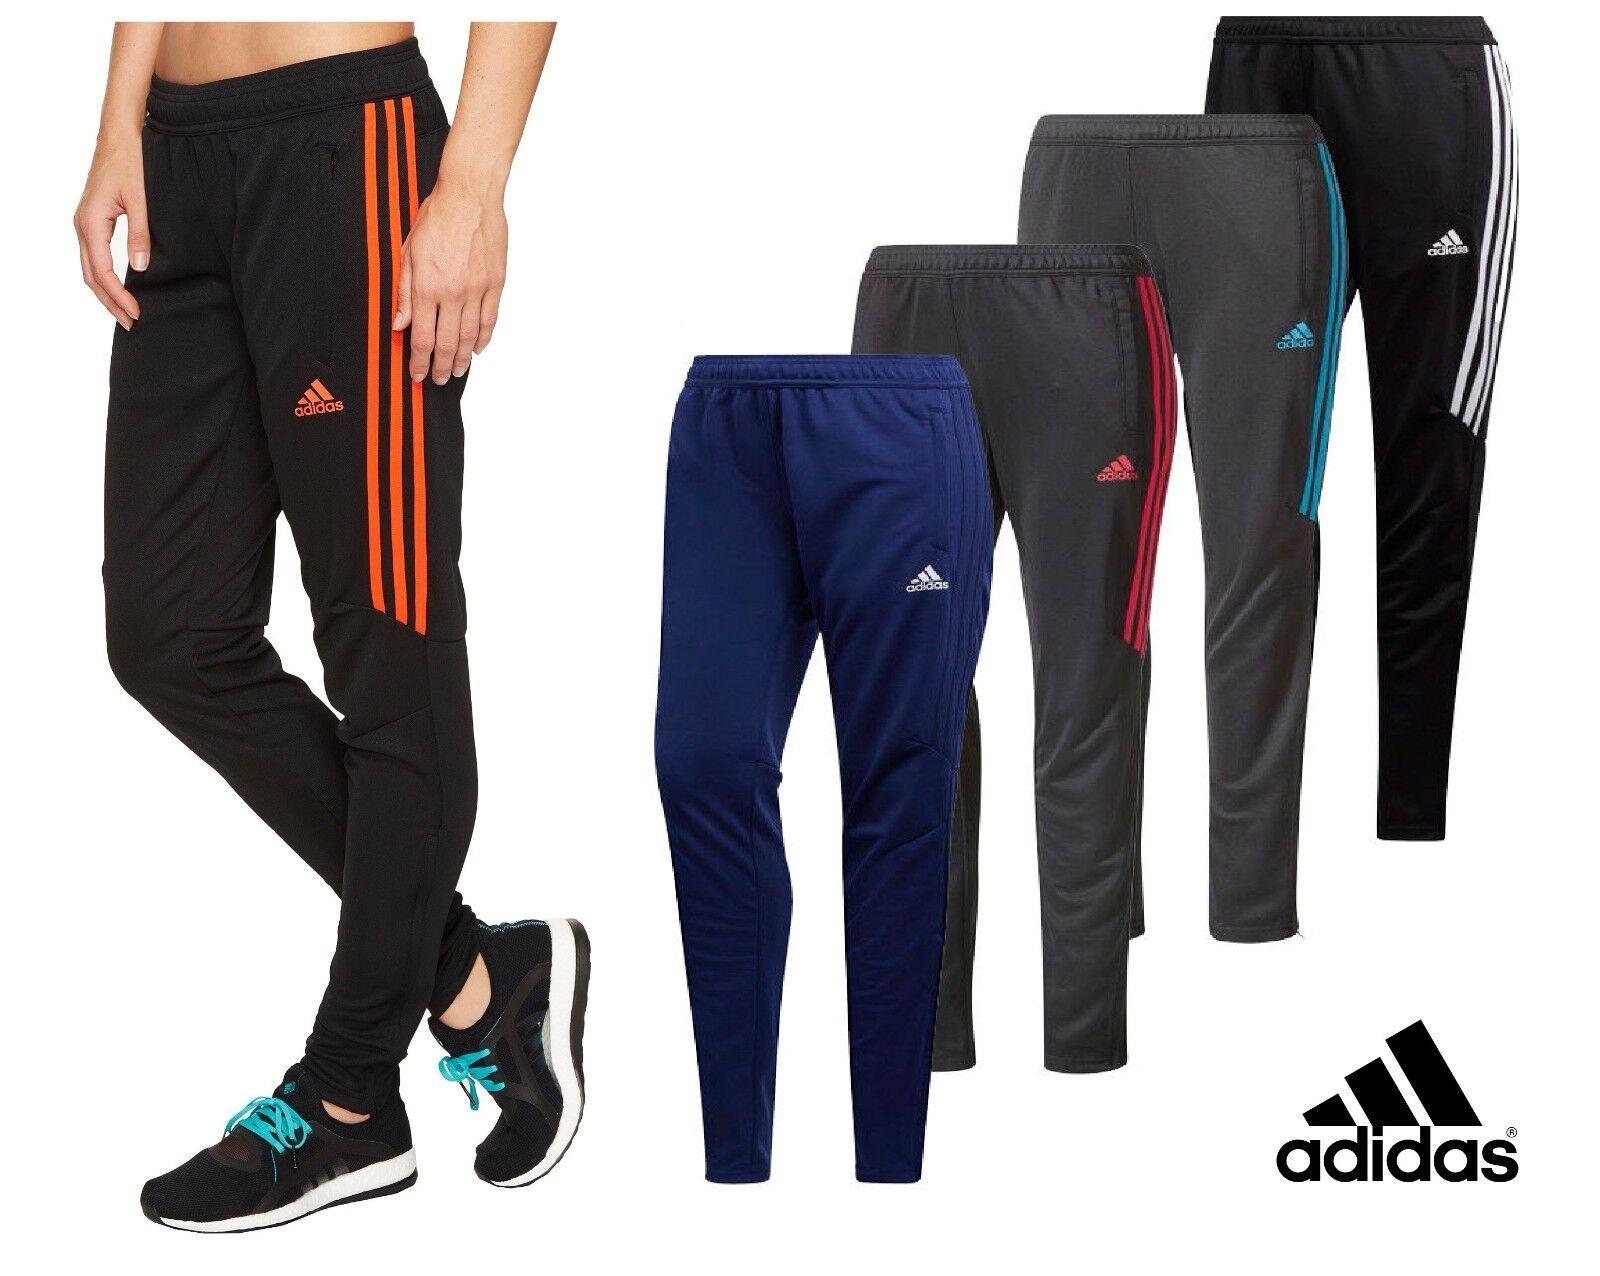 Adidas Damen NEU Tiro 17 ClimaCool Training Slim Fit Athletic Pants